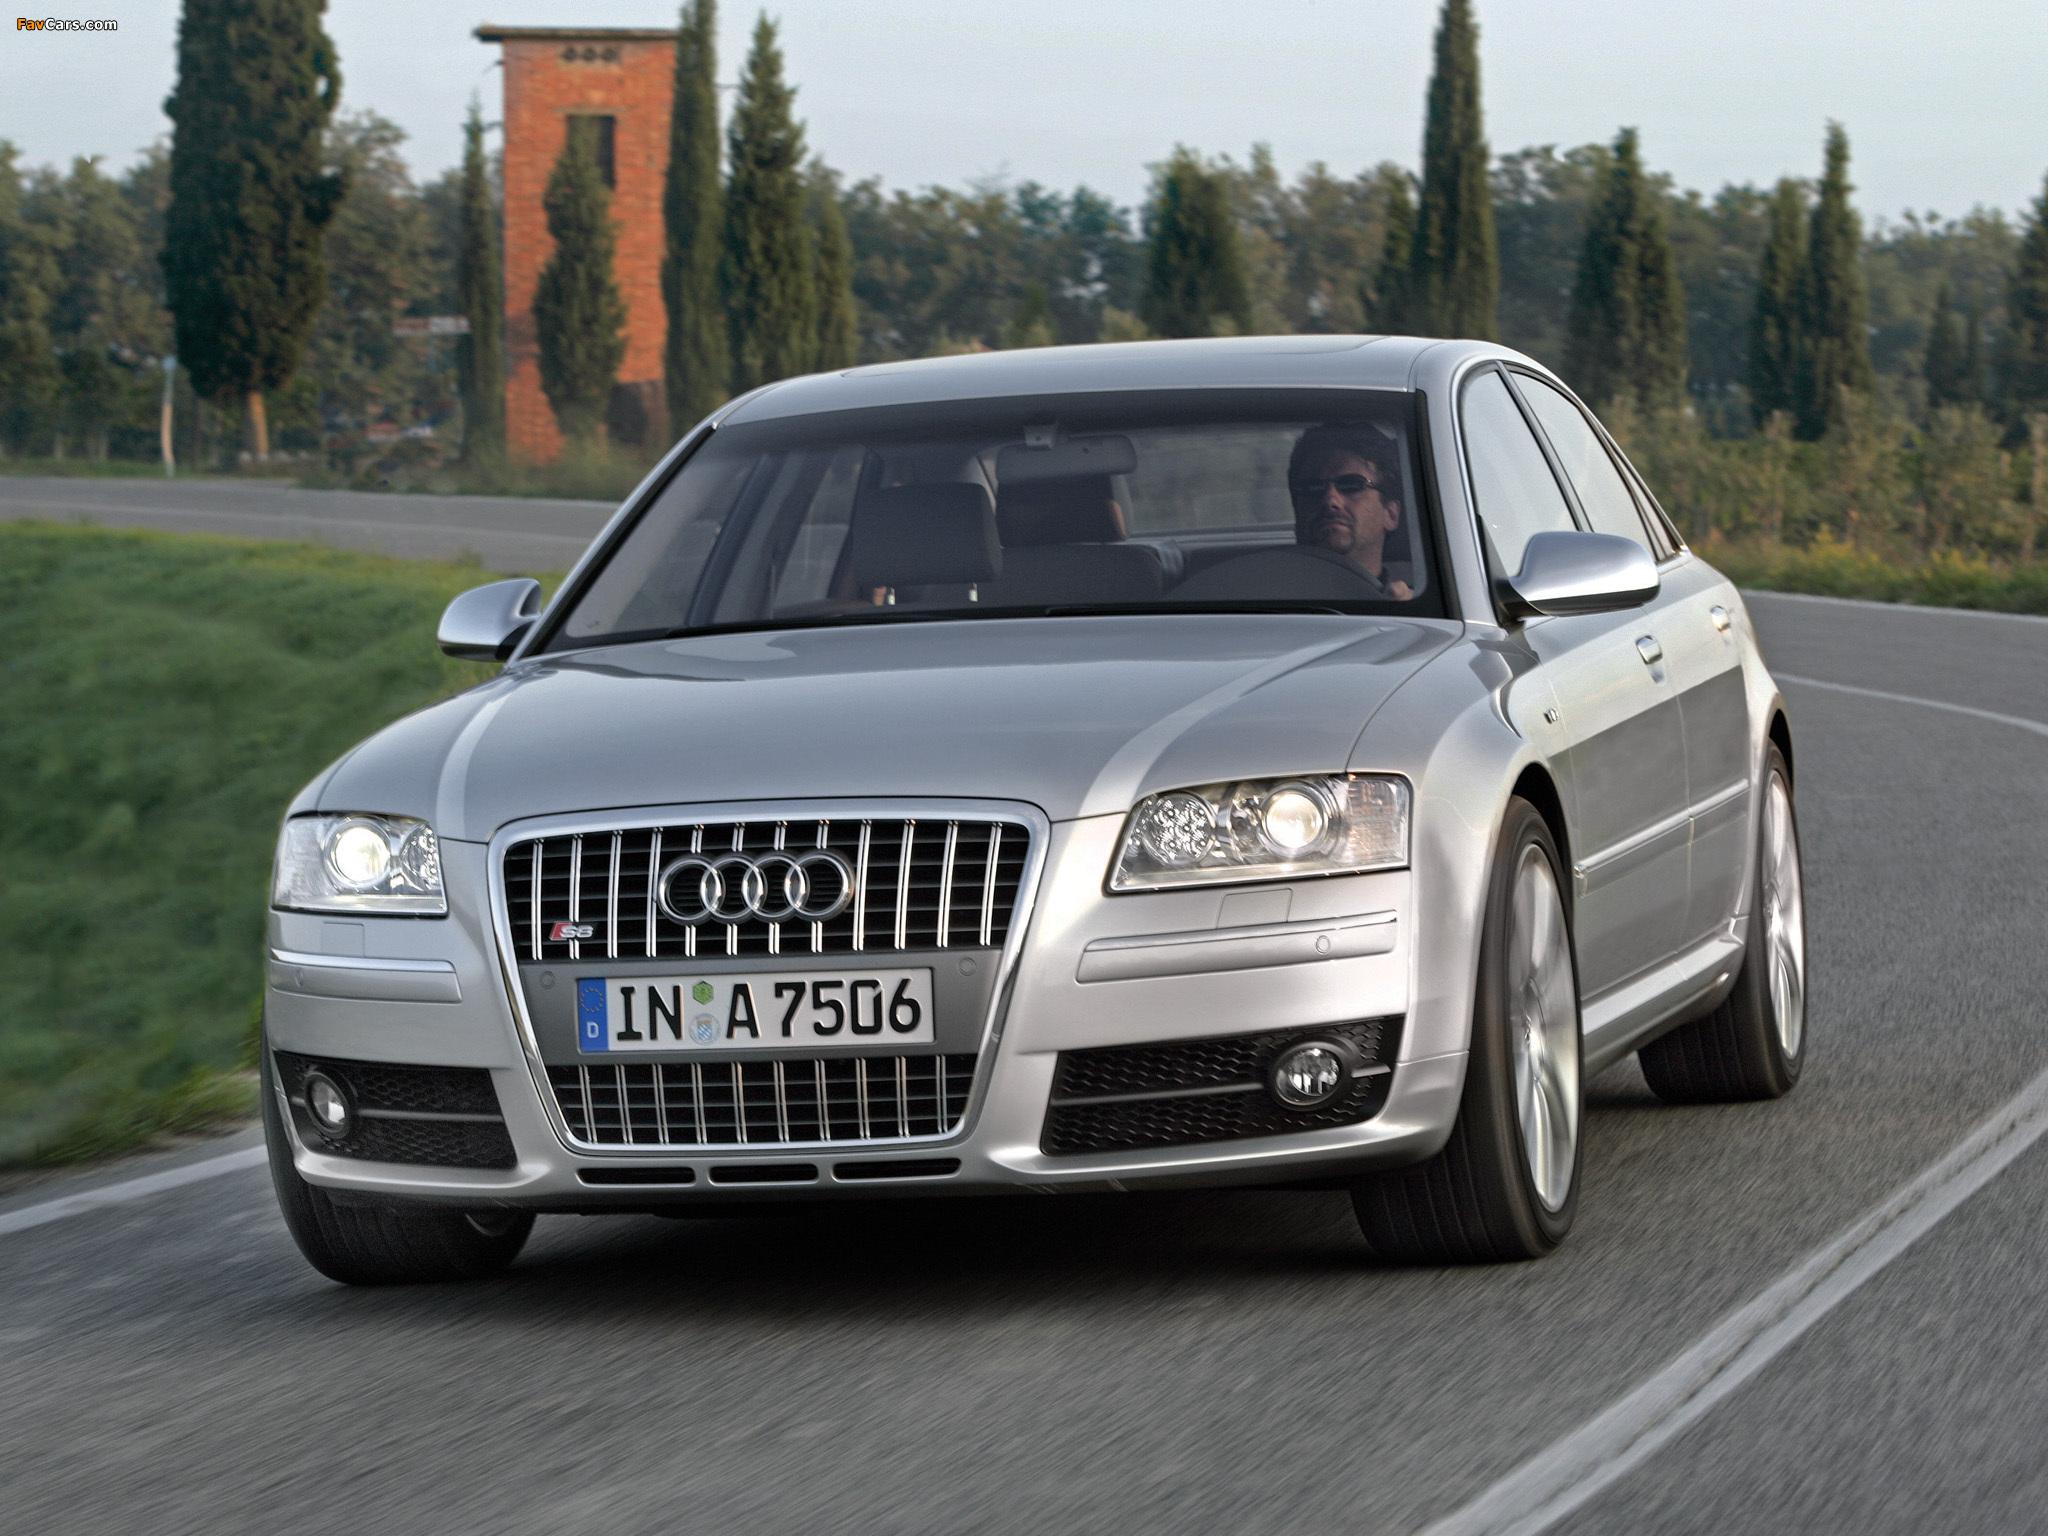 Audi S8 D3 200508 wallpapers 2048x1536 2048x1536